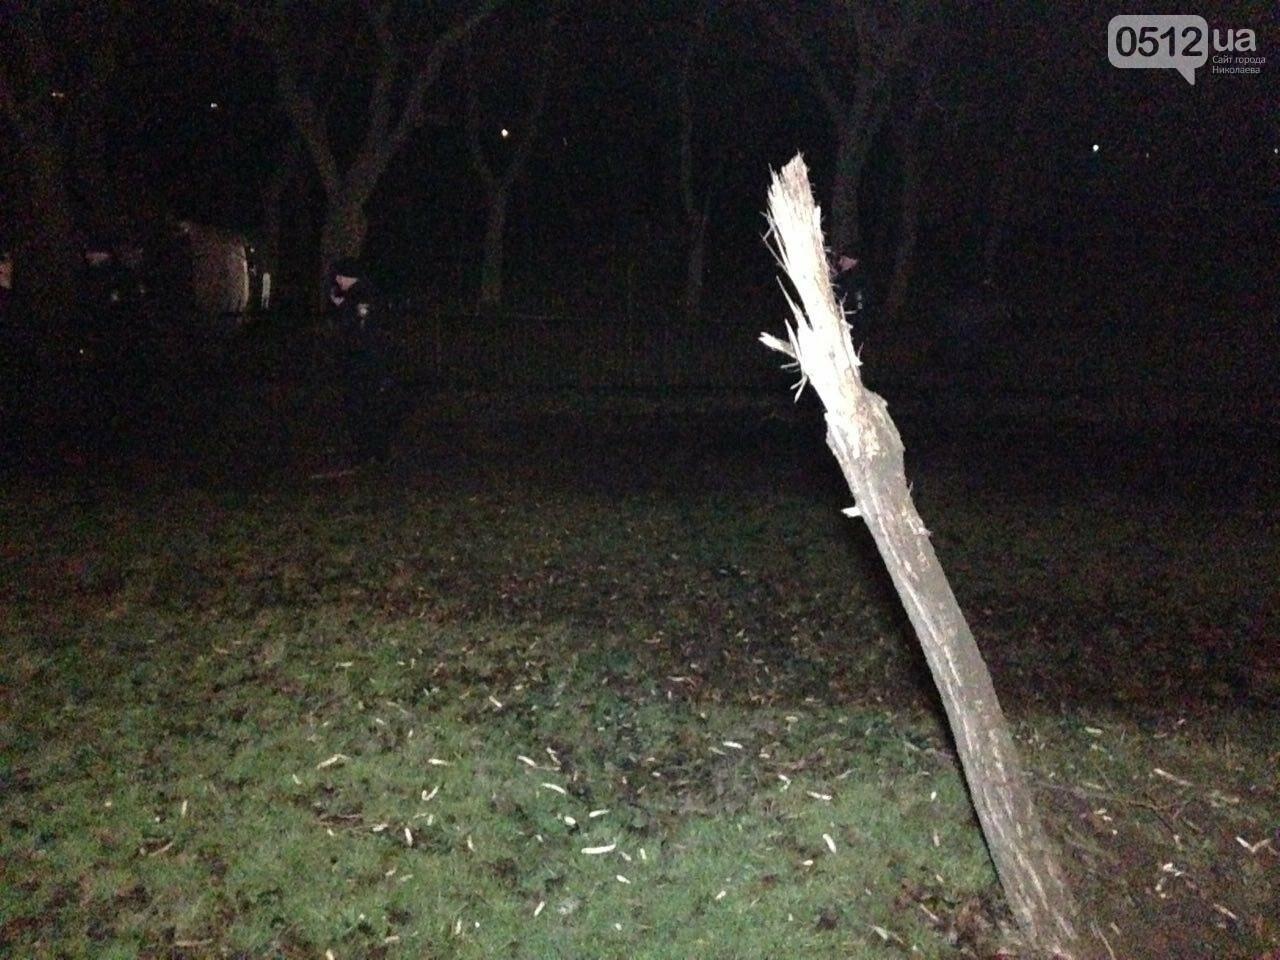 Страшное ДТП в Николаеве: 2 парня и 2 девушки на Мазде влетели в дерево - водитель умер на месте аварии, - ФОТО, фото-4